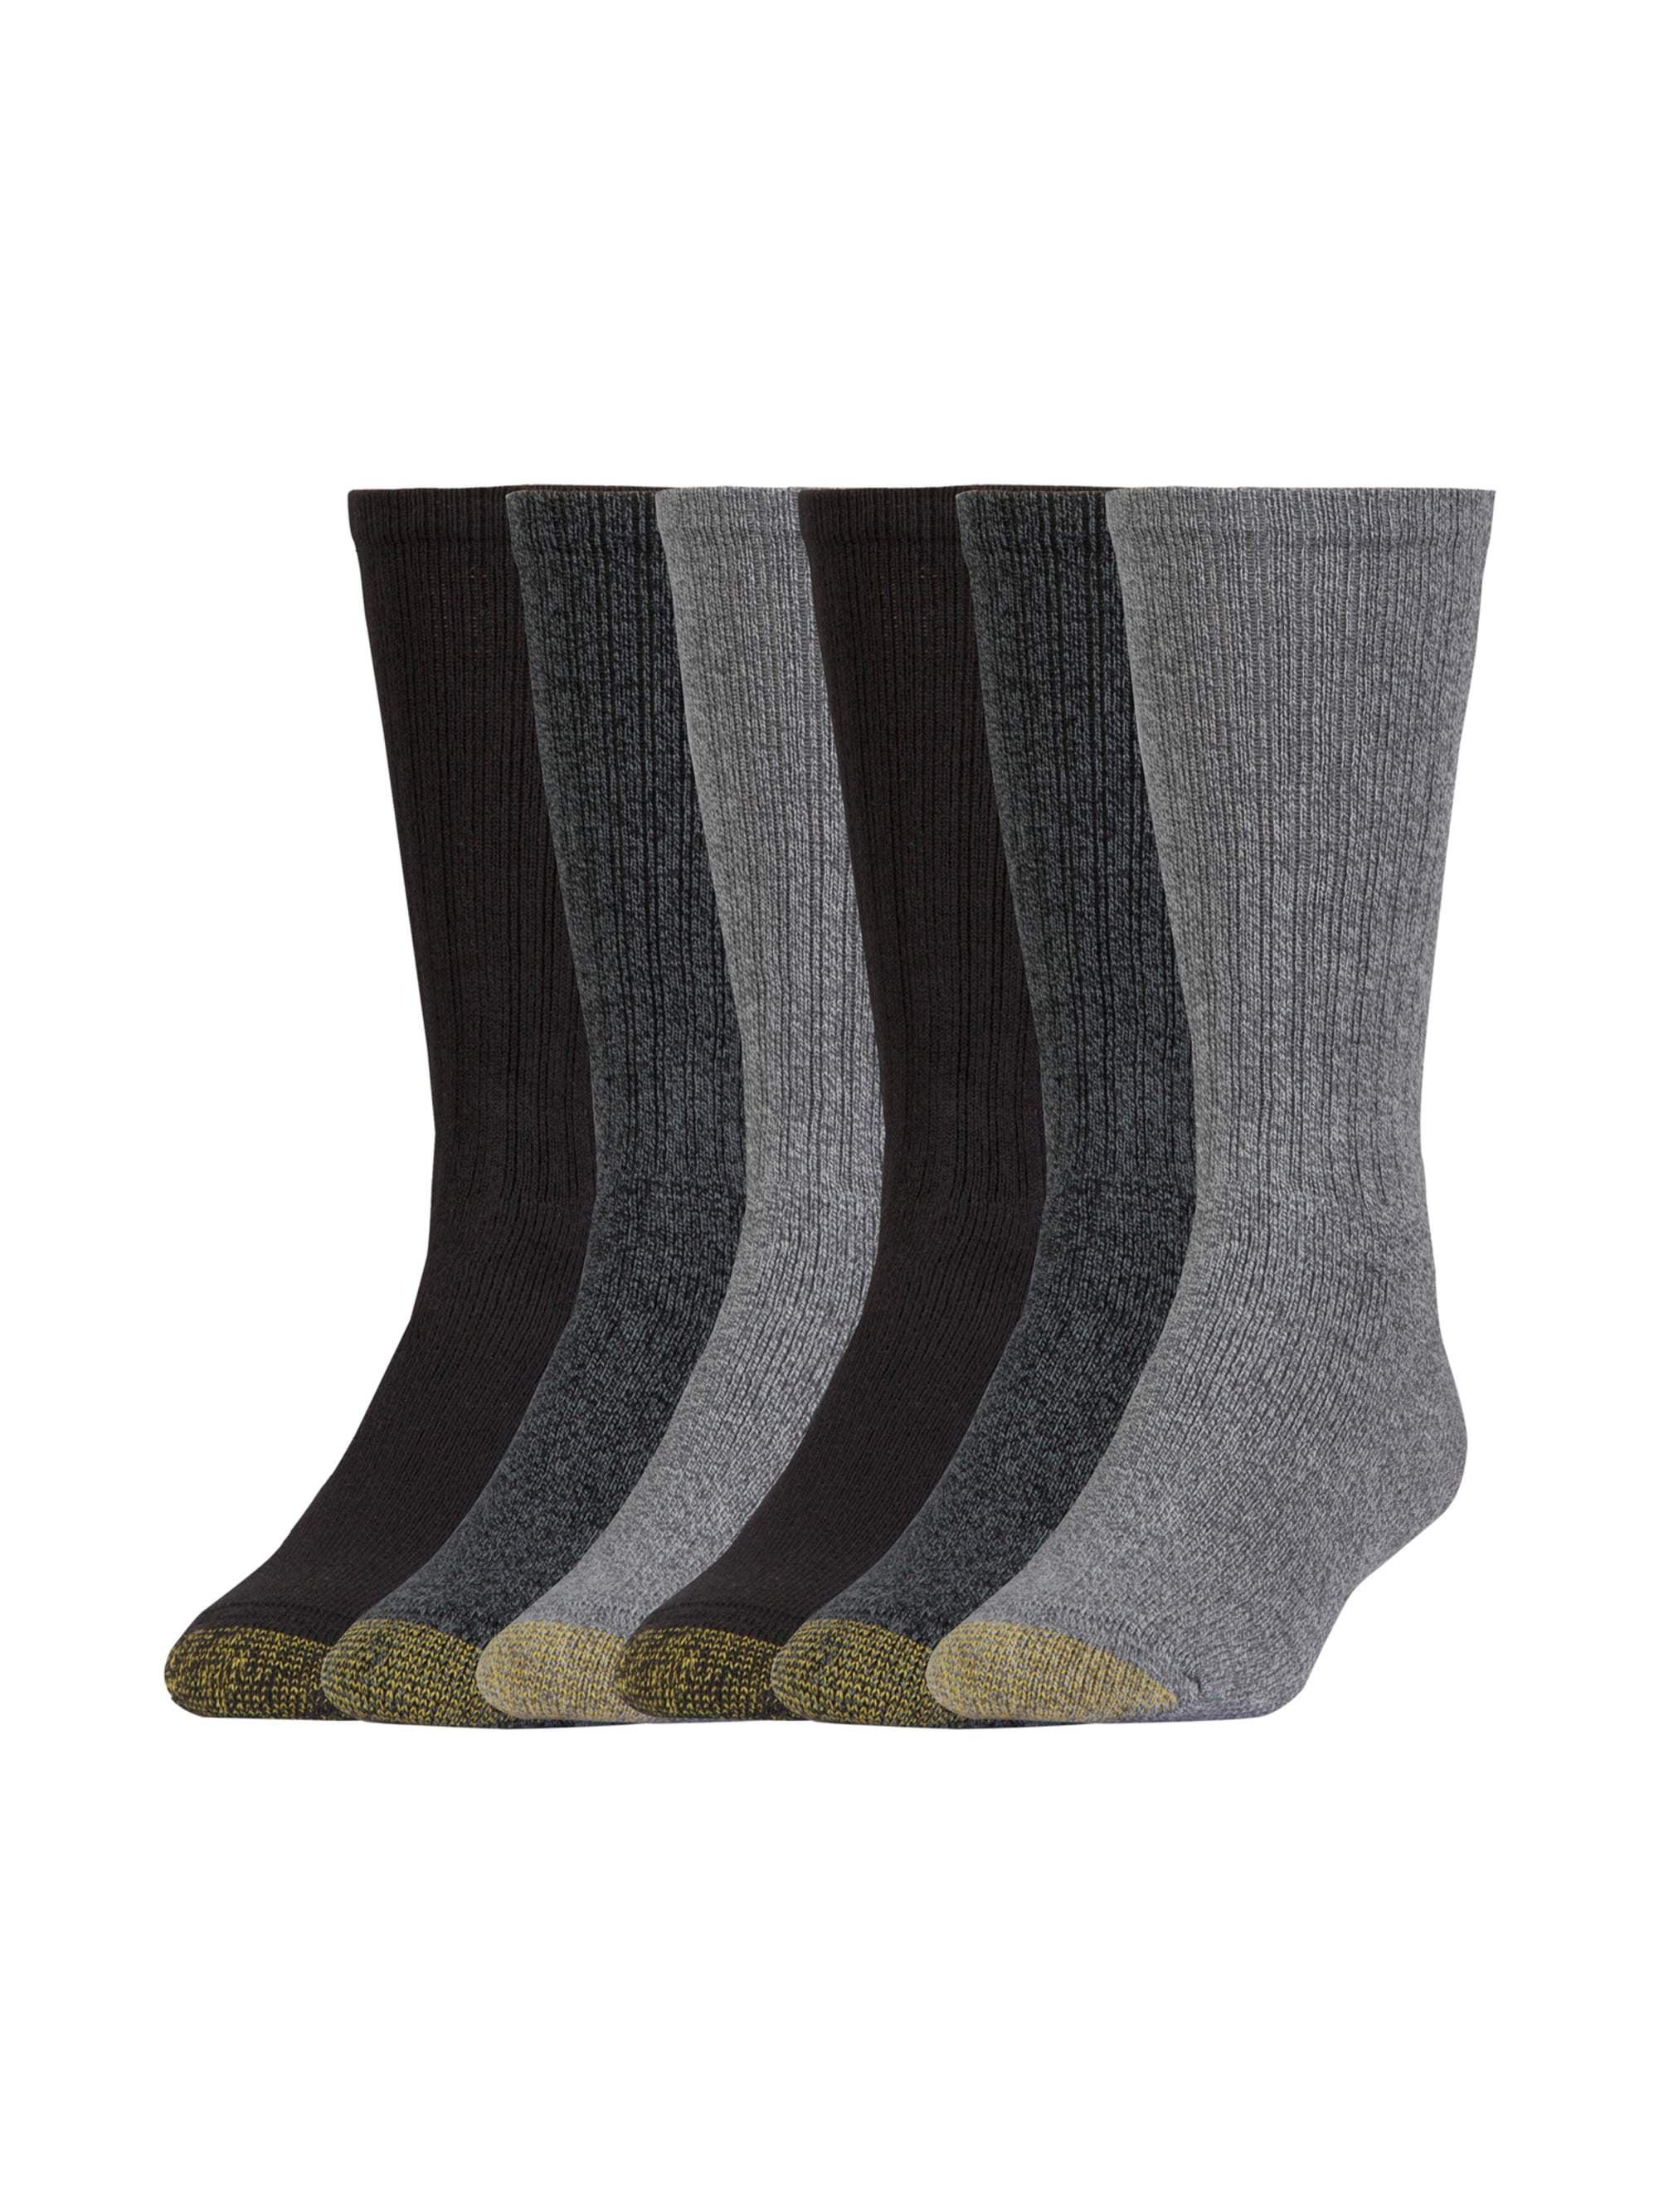 Gold Toe Girls Flat Knit No Show Socks 6 Pairs